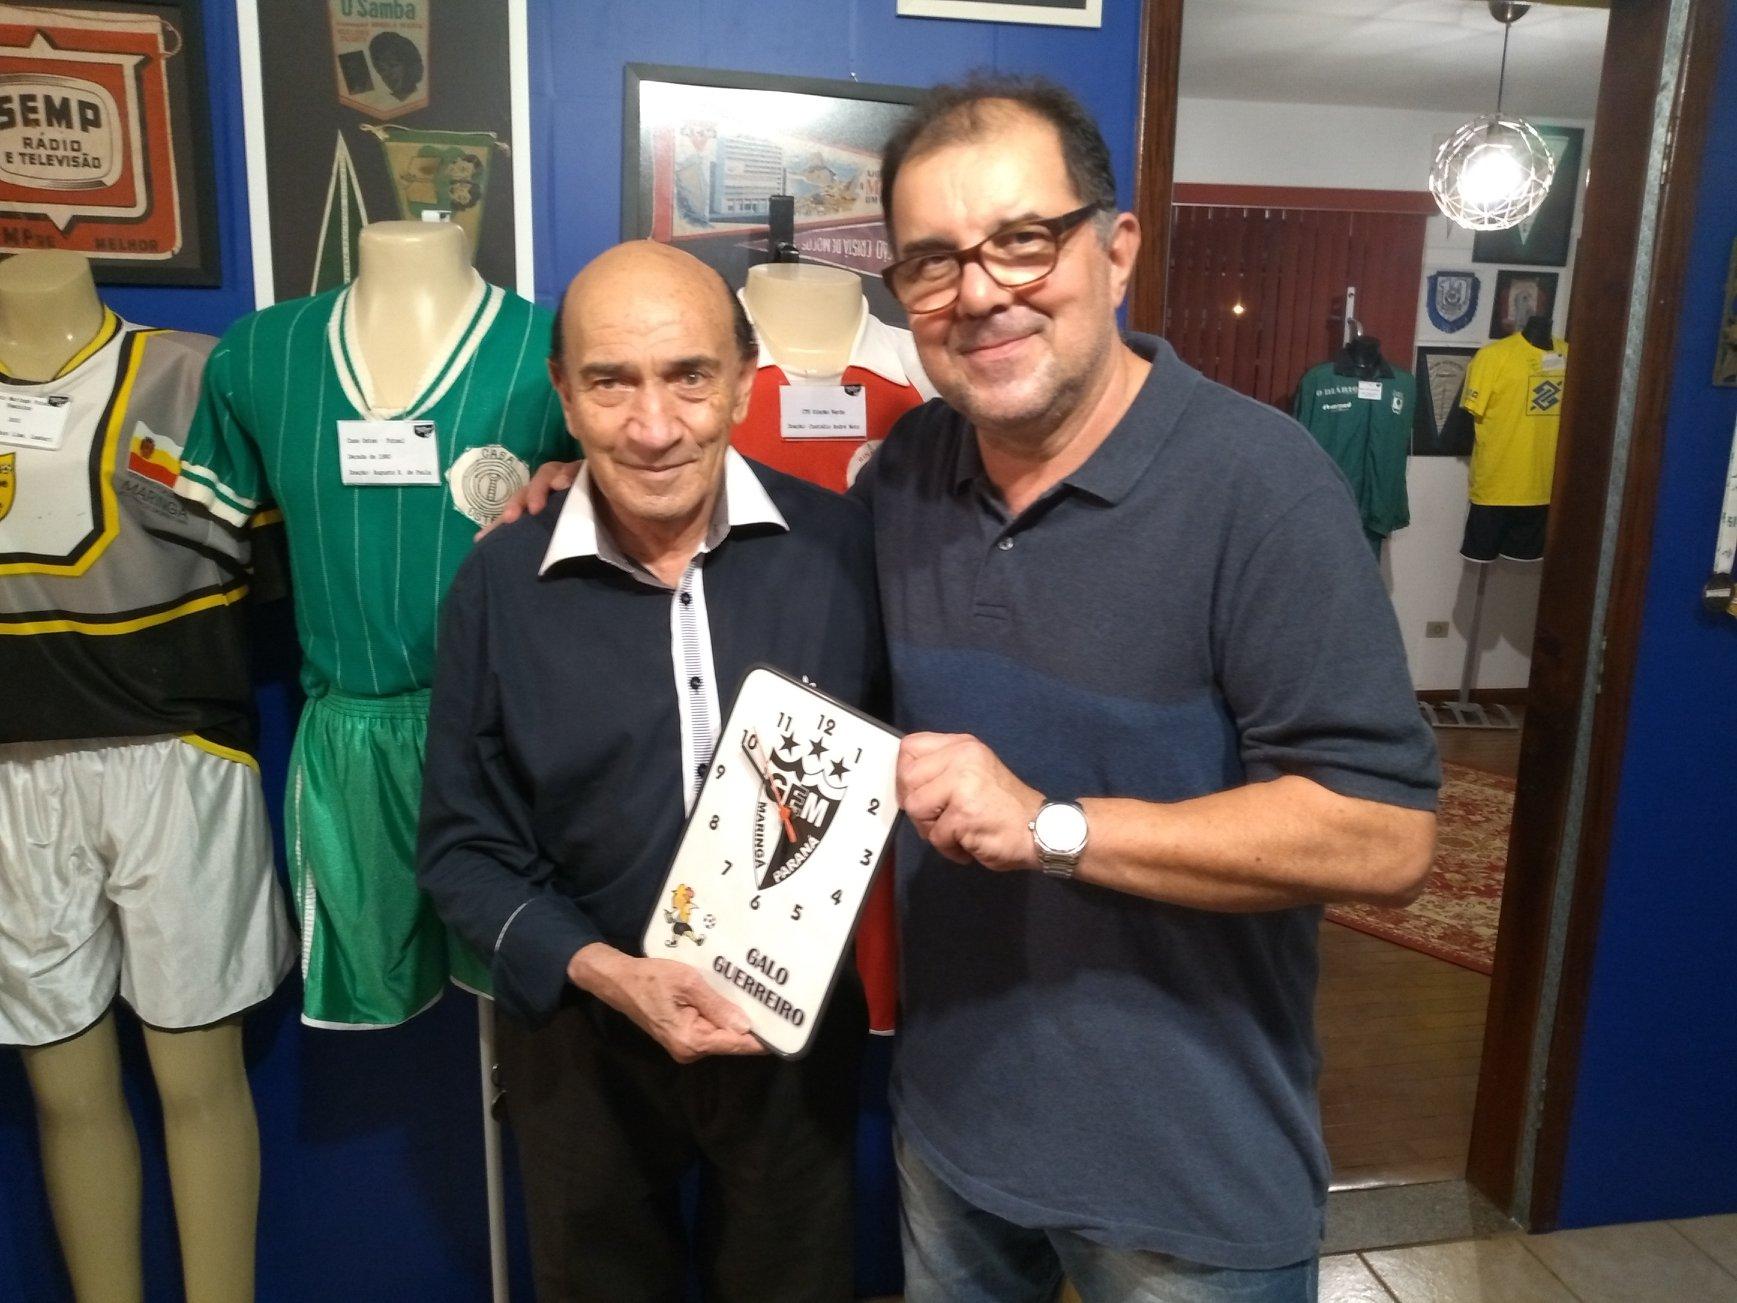 Relógio do Grêmio Maringá doado pelo jornalista Verdelírio Barbosa